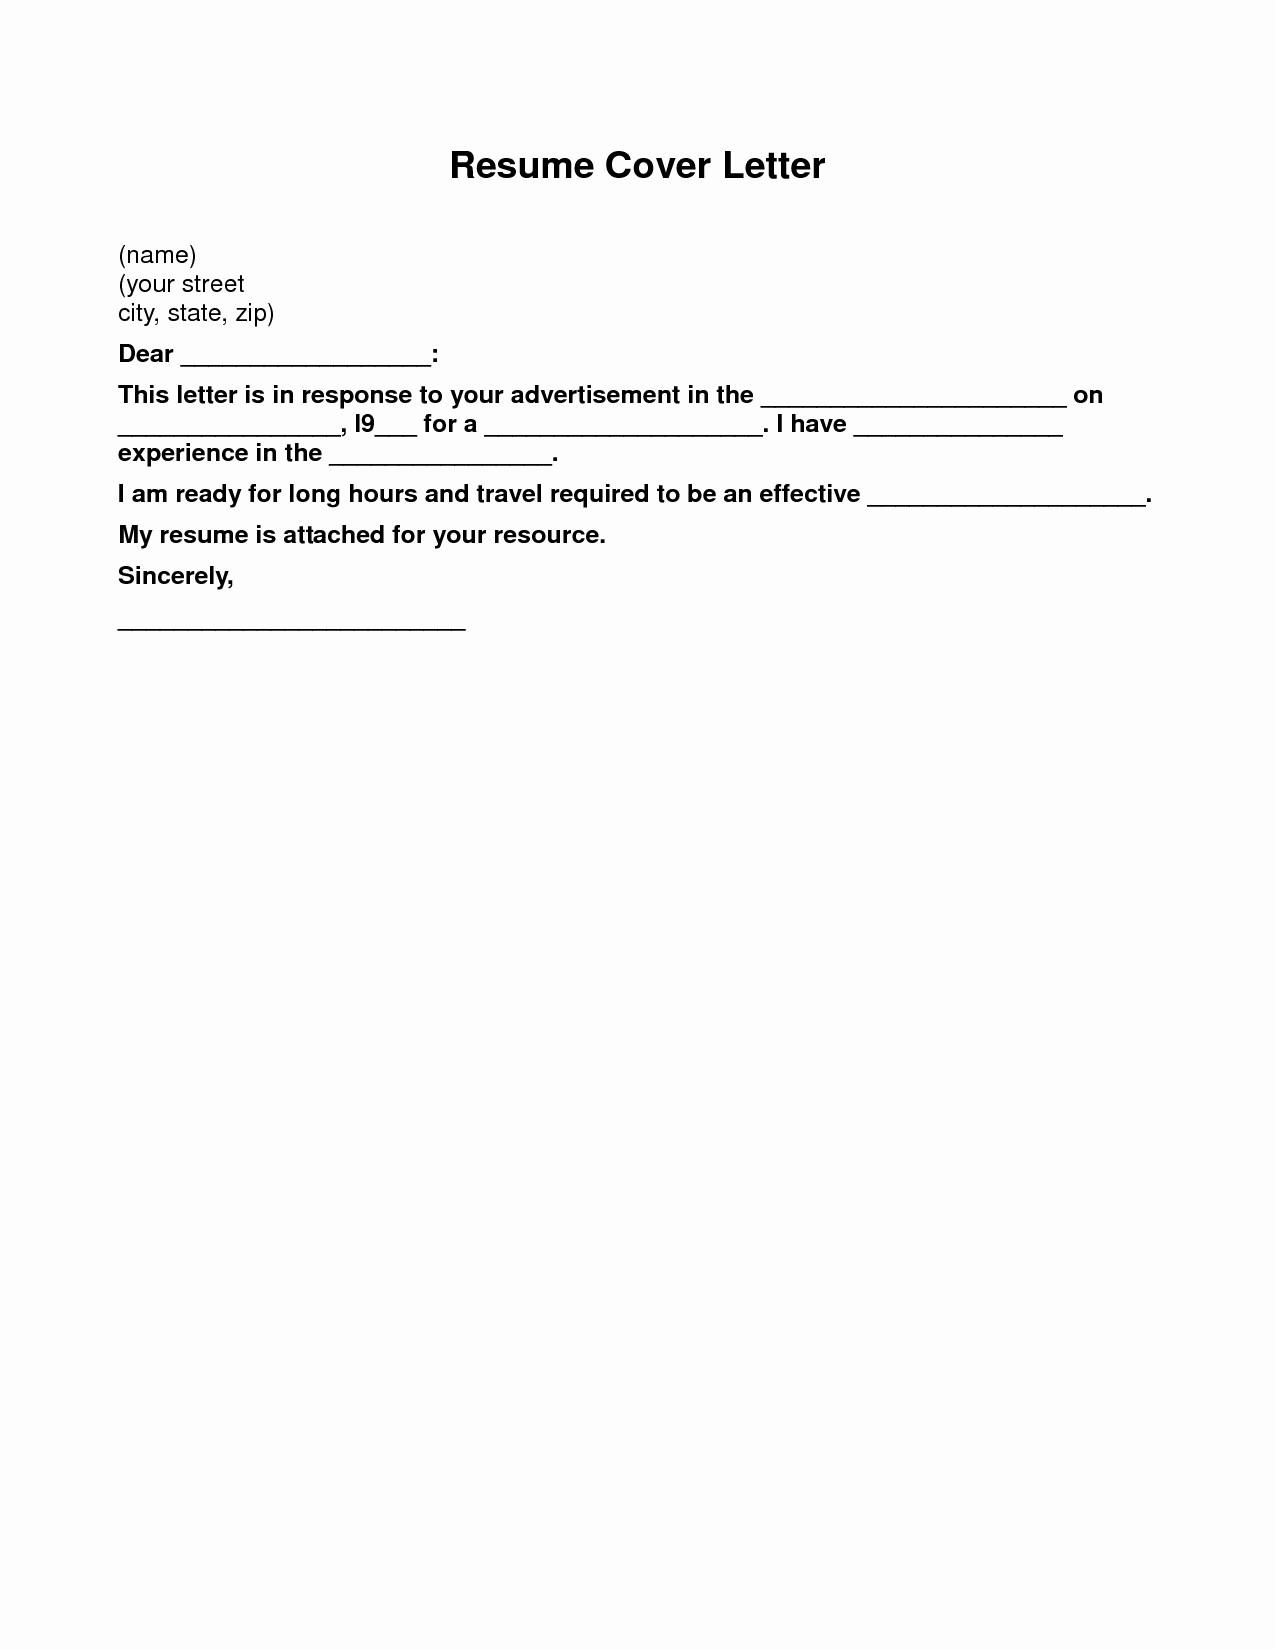 Cover Letter Of A Resume Elegant Basic Cover Letter for A Resume